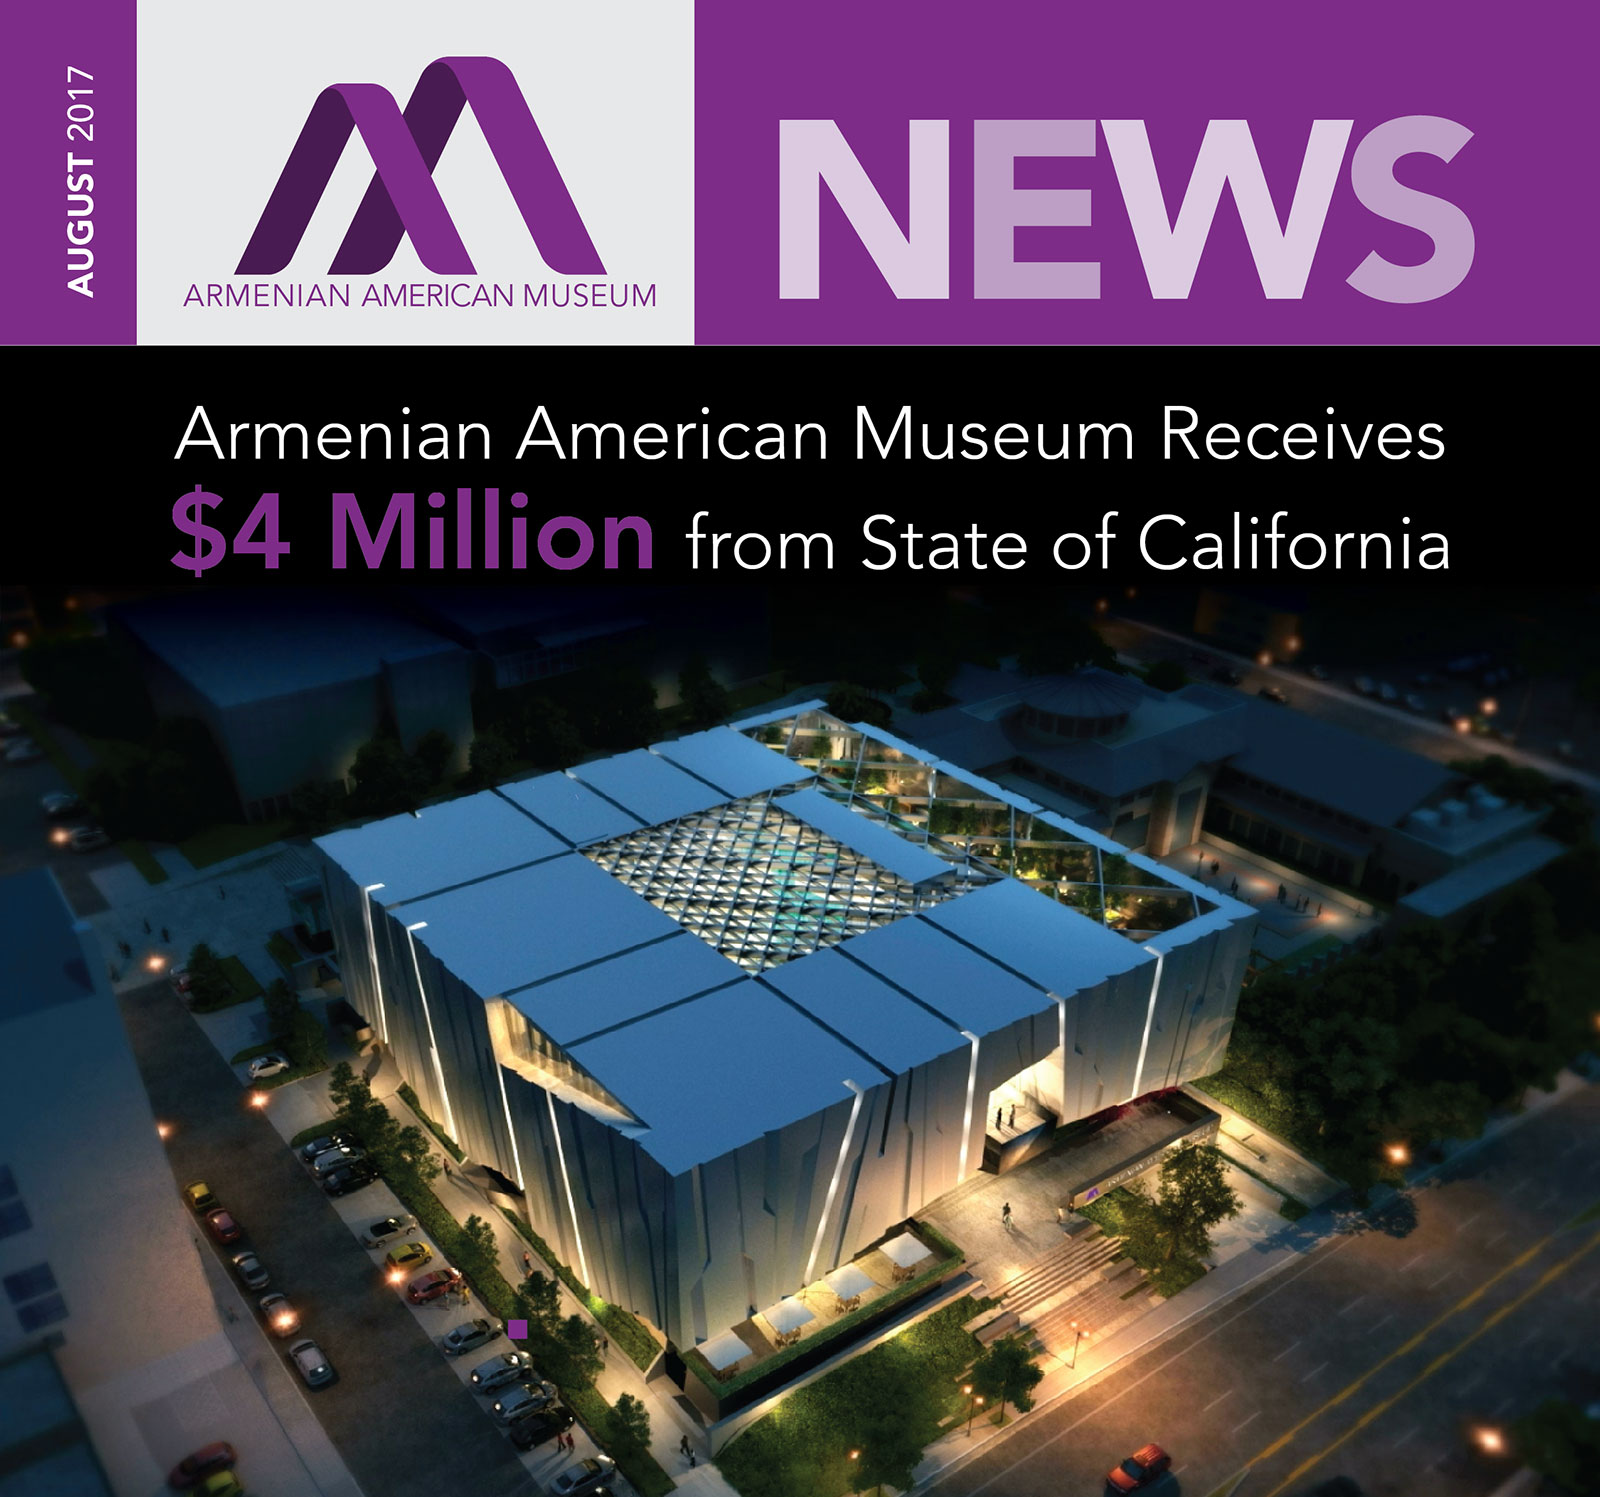 Armenian American Museum Newsletter August 2017